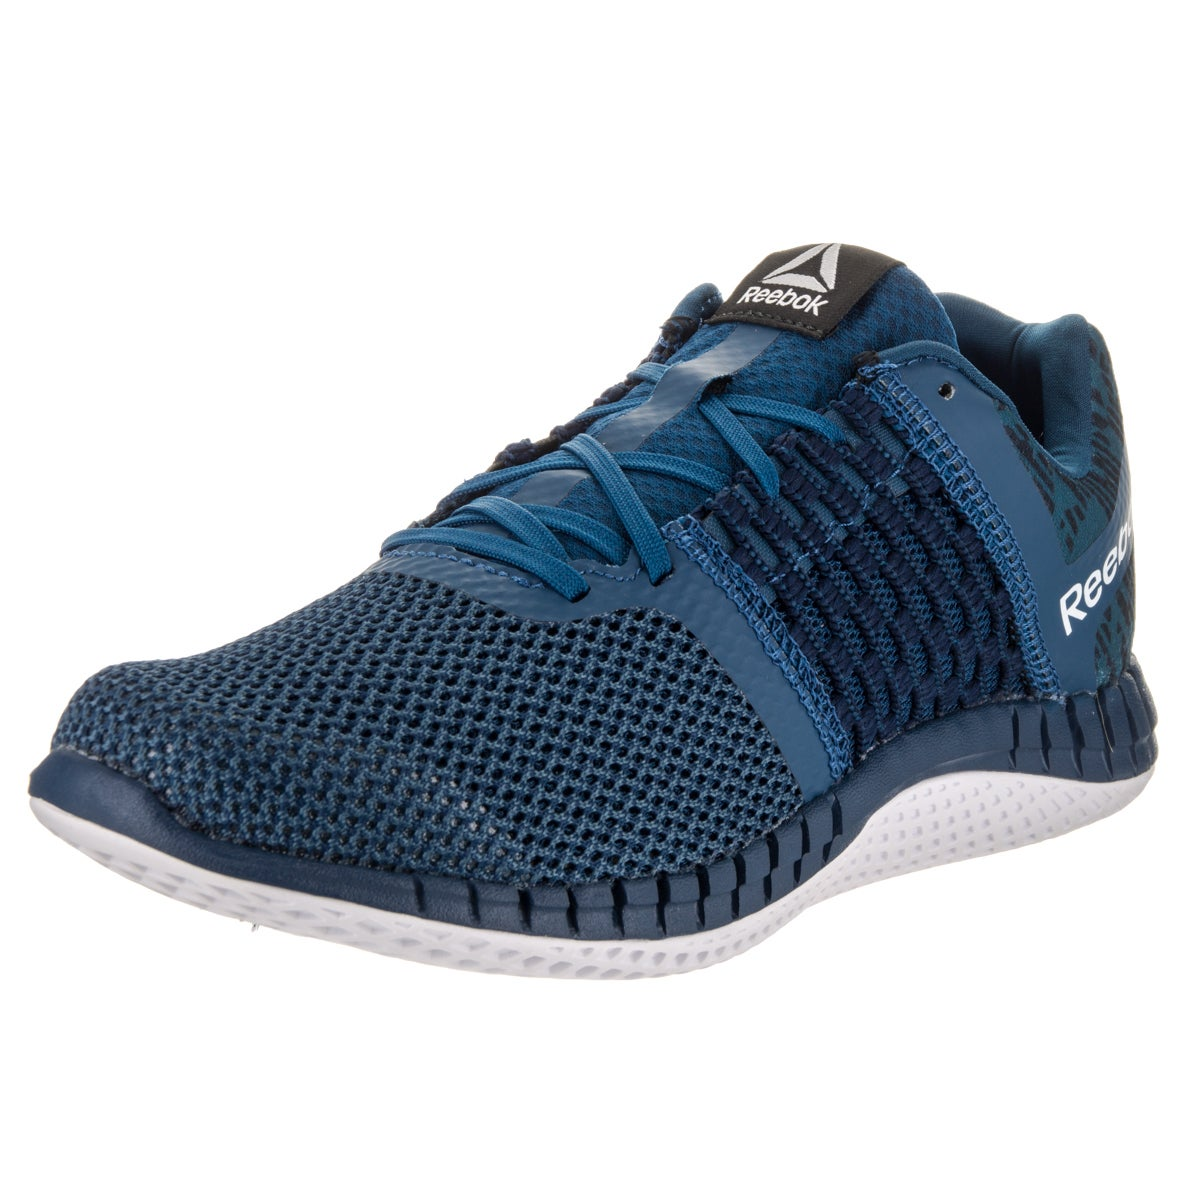 6011adb4544 Shop Reebok Women s Zprint Run Hazard Gp Running Shoe - Free ...